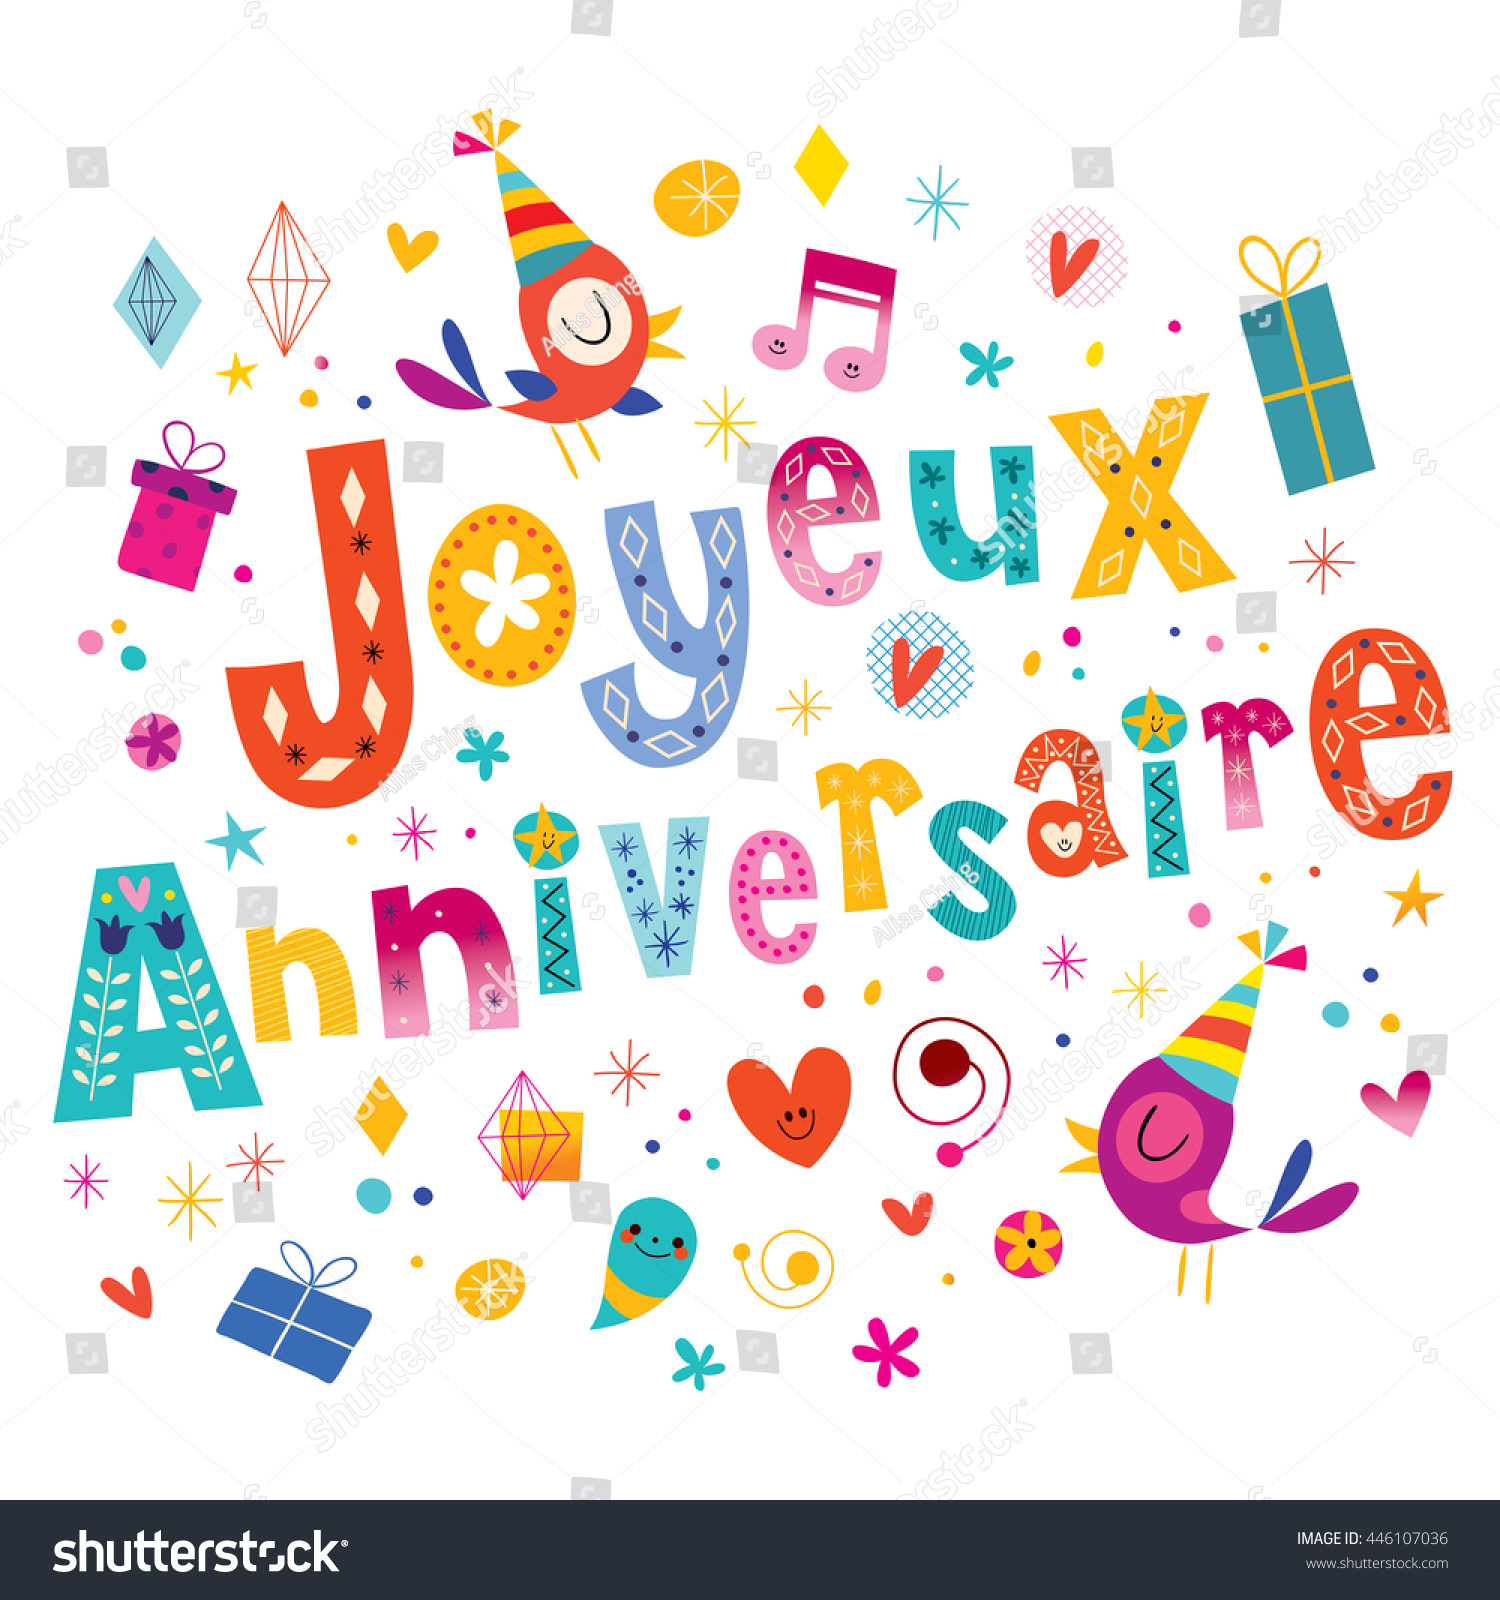 Joyeux Anniversaire Happy Birthday French Greeting Stock